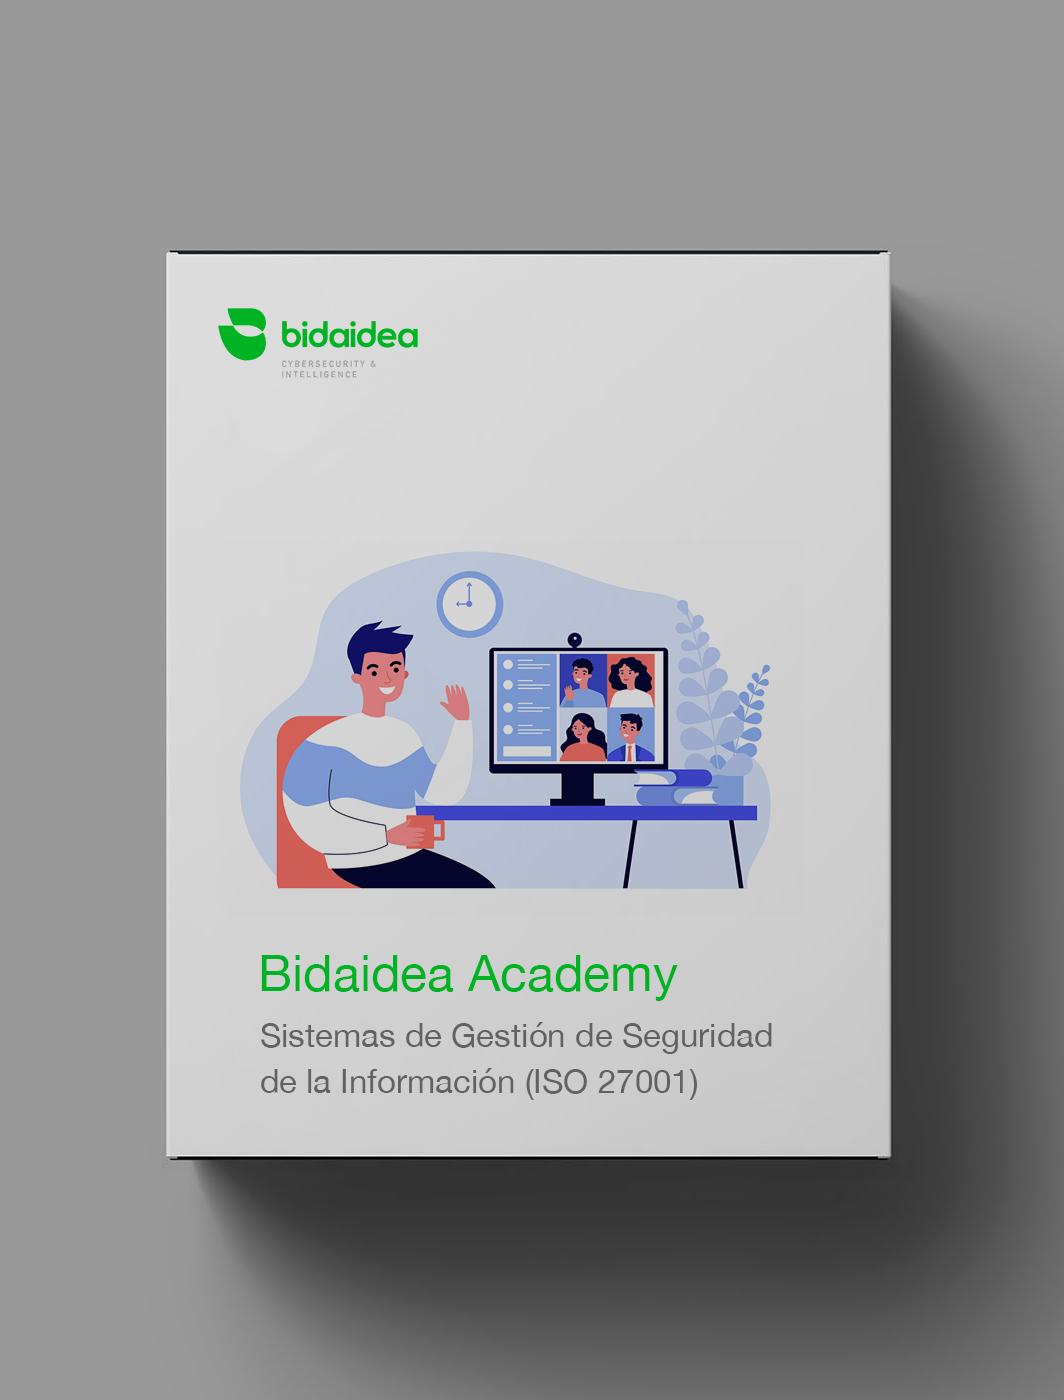 cyberpacks bidaidea academy 04 - Empresa de Ciberseguridad